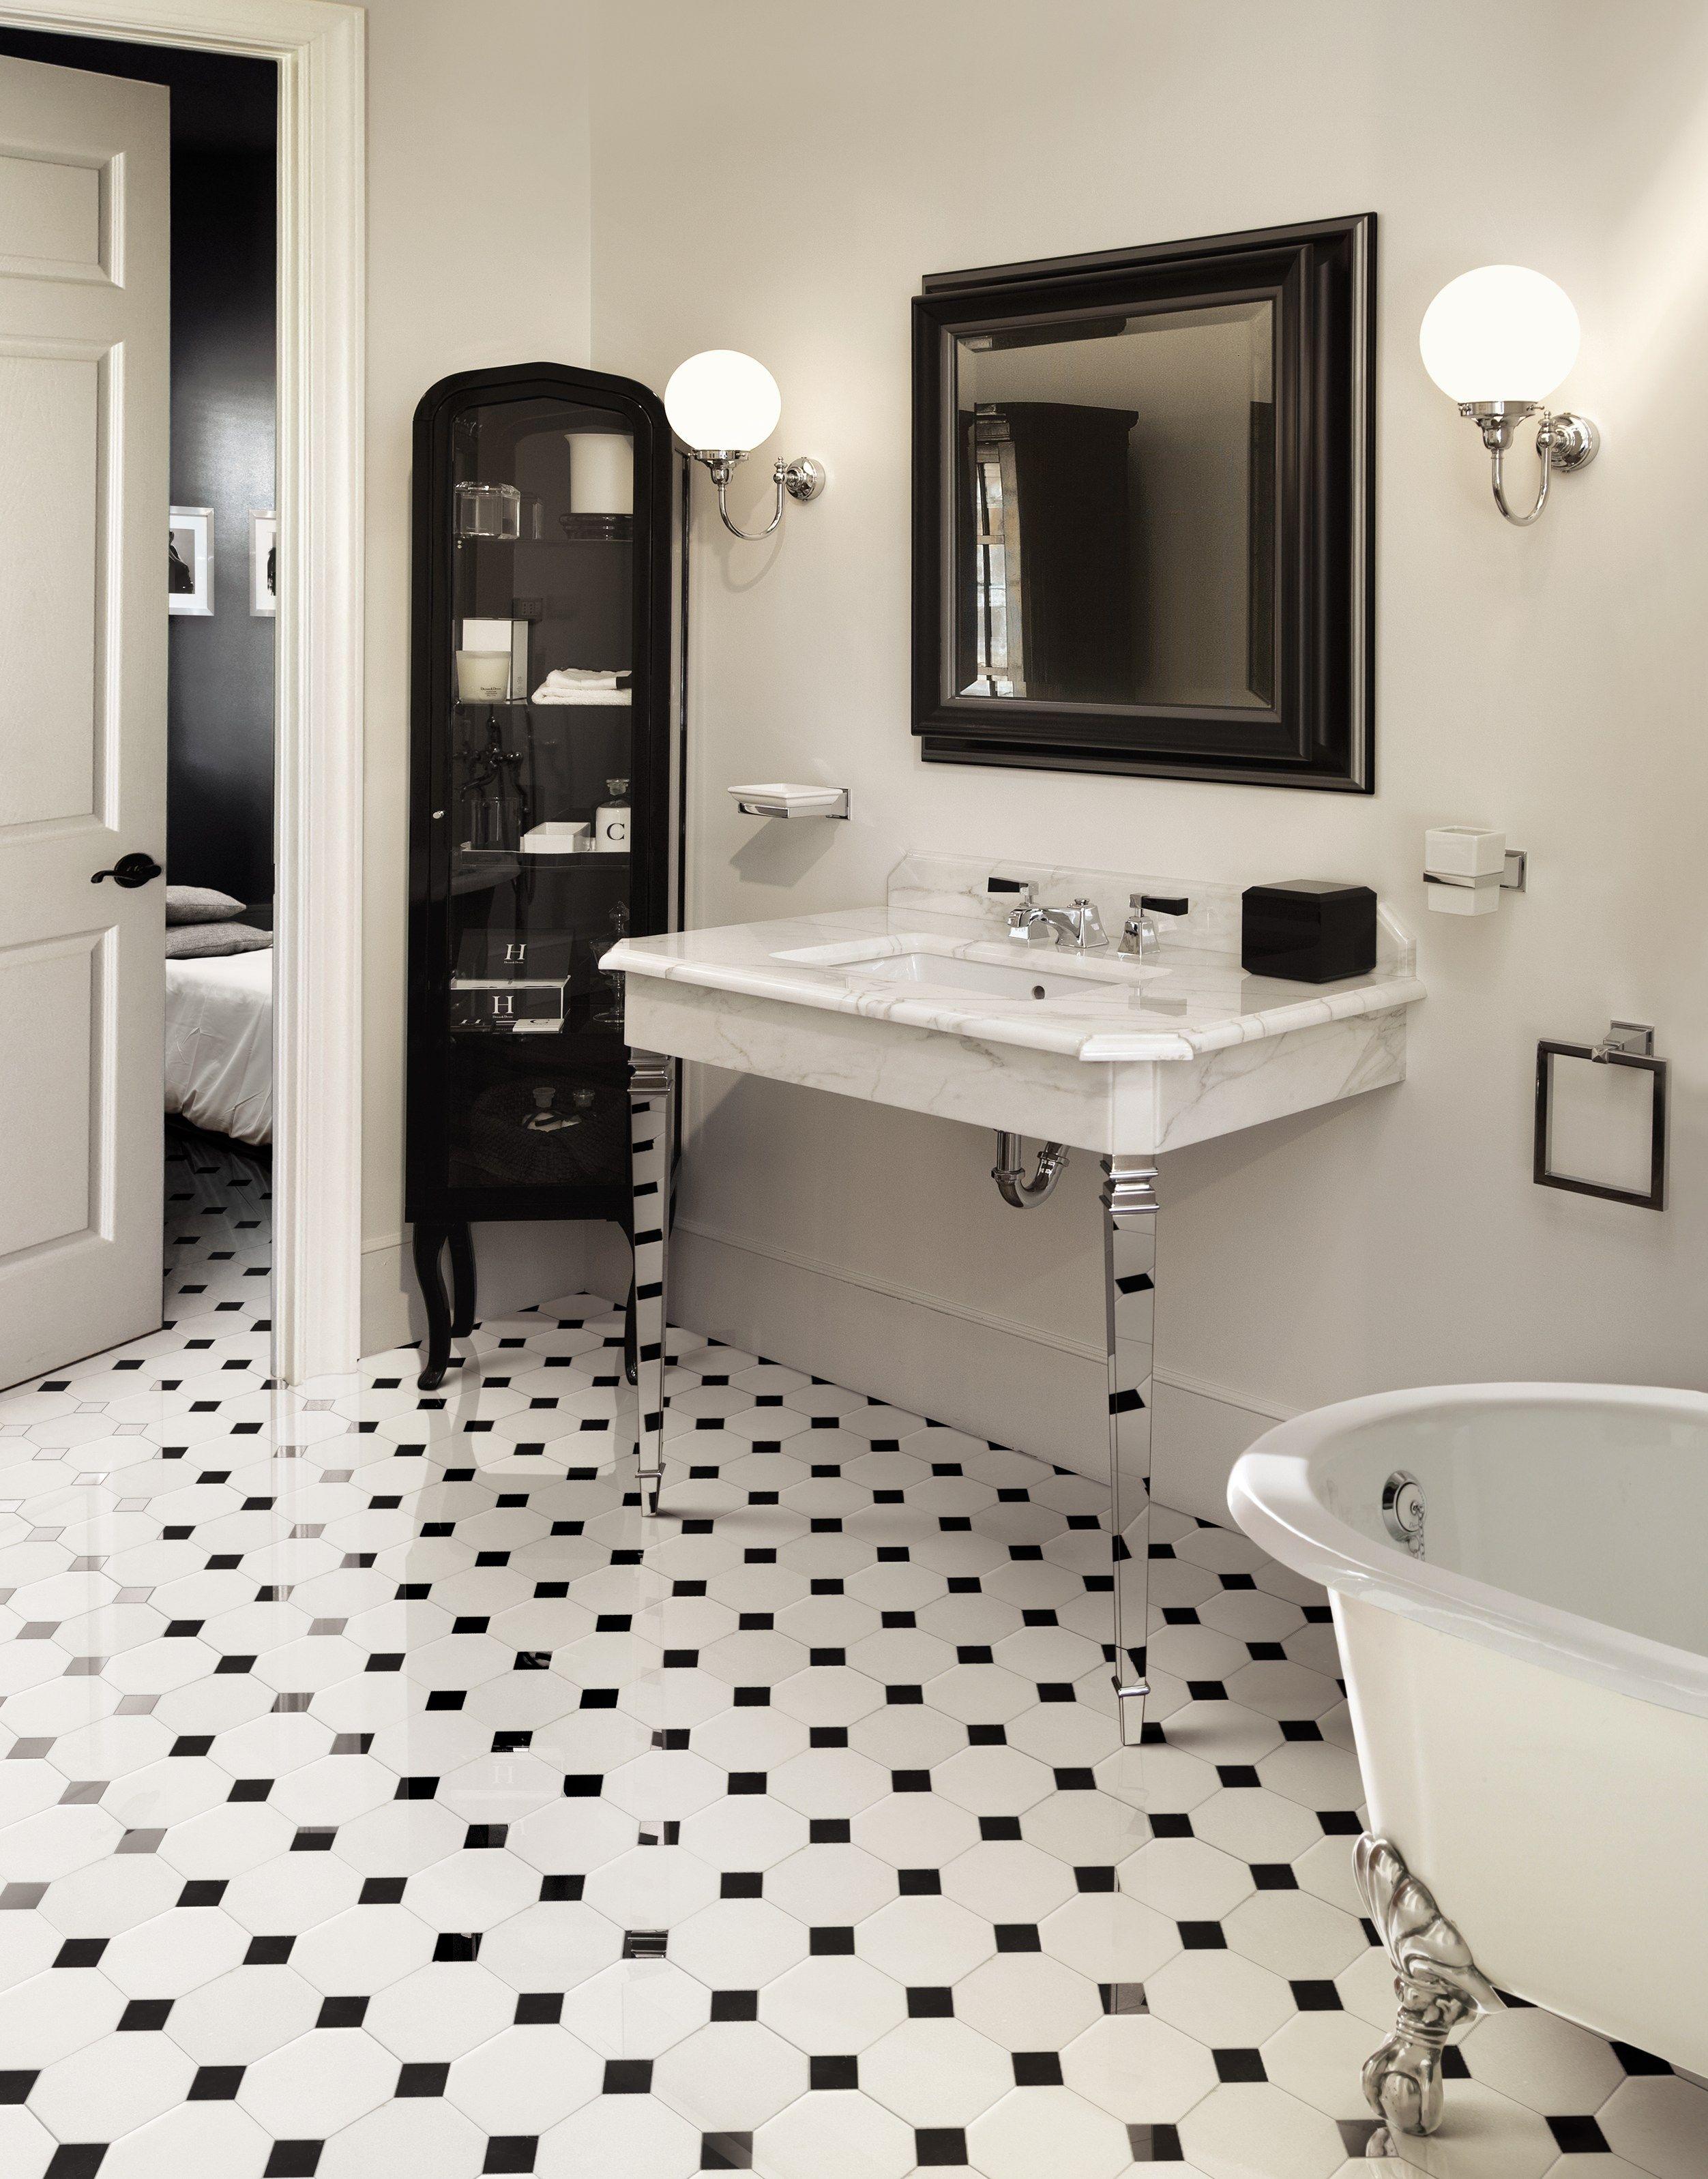 MARBLE FLOOR TILES ÉLITE MARBLE TILES BY DEVON&DEVON | bathroom ...